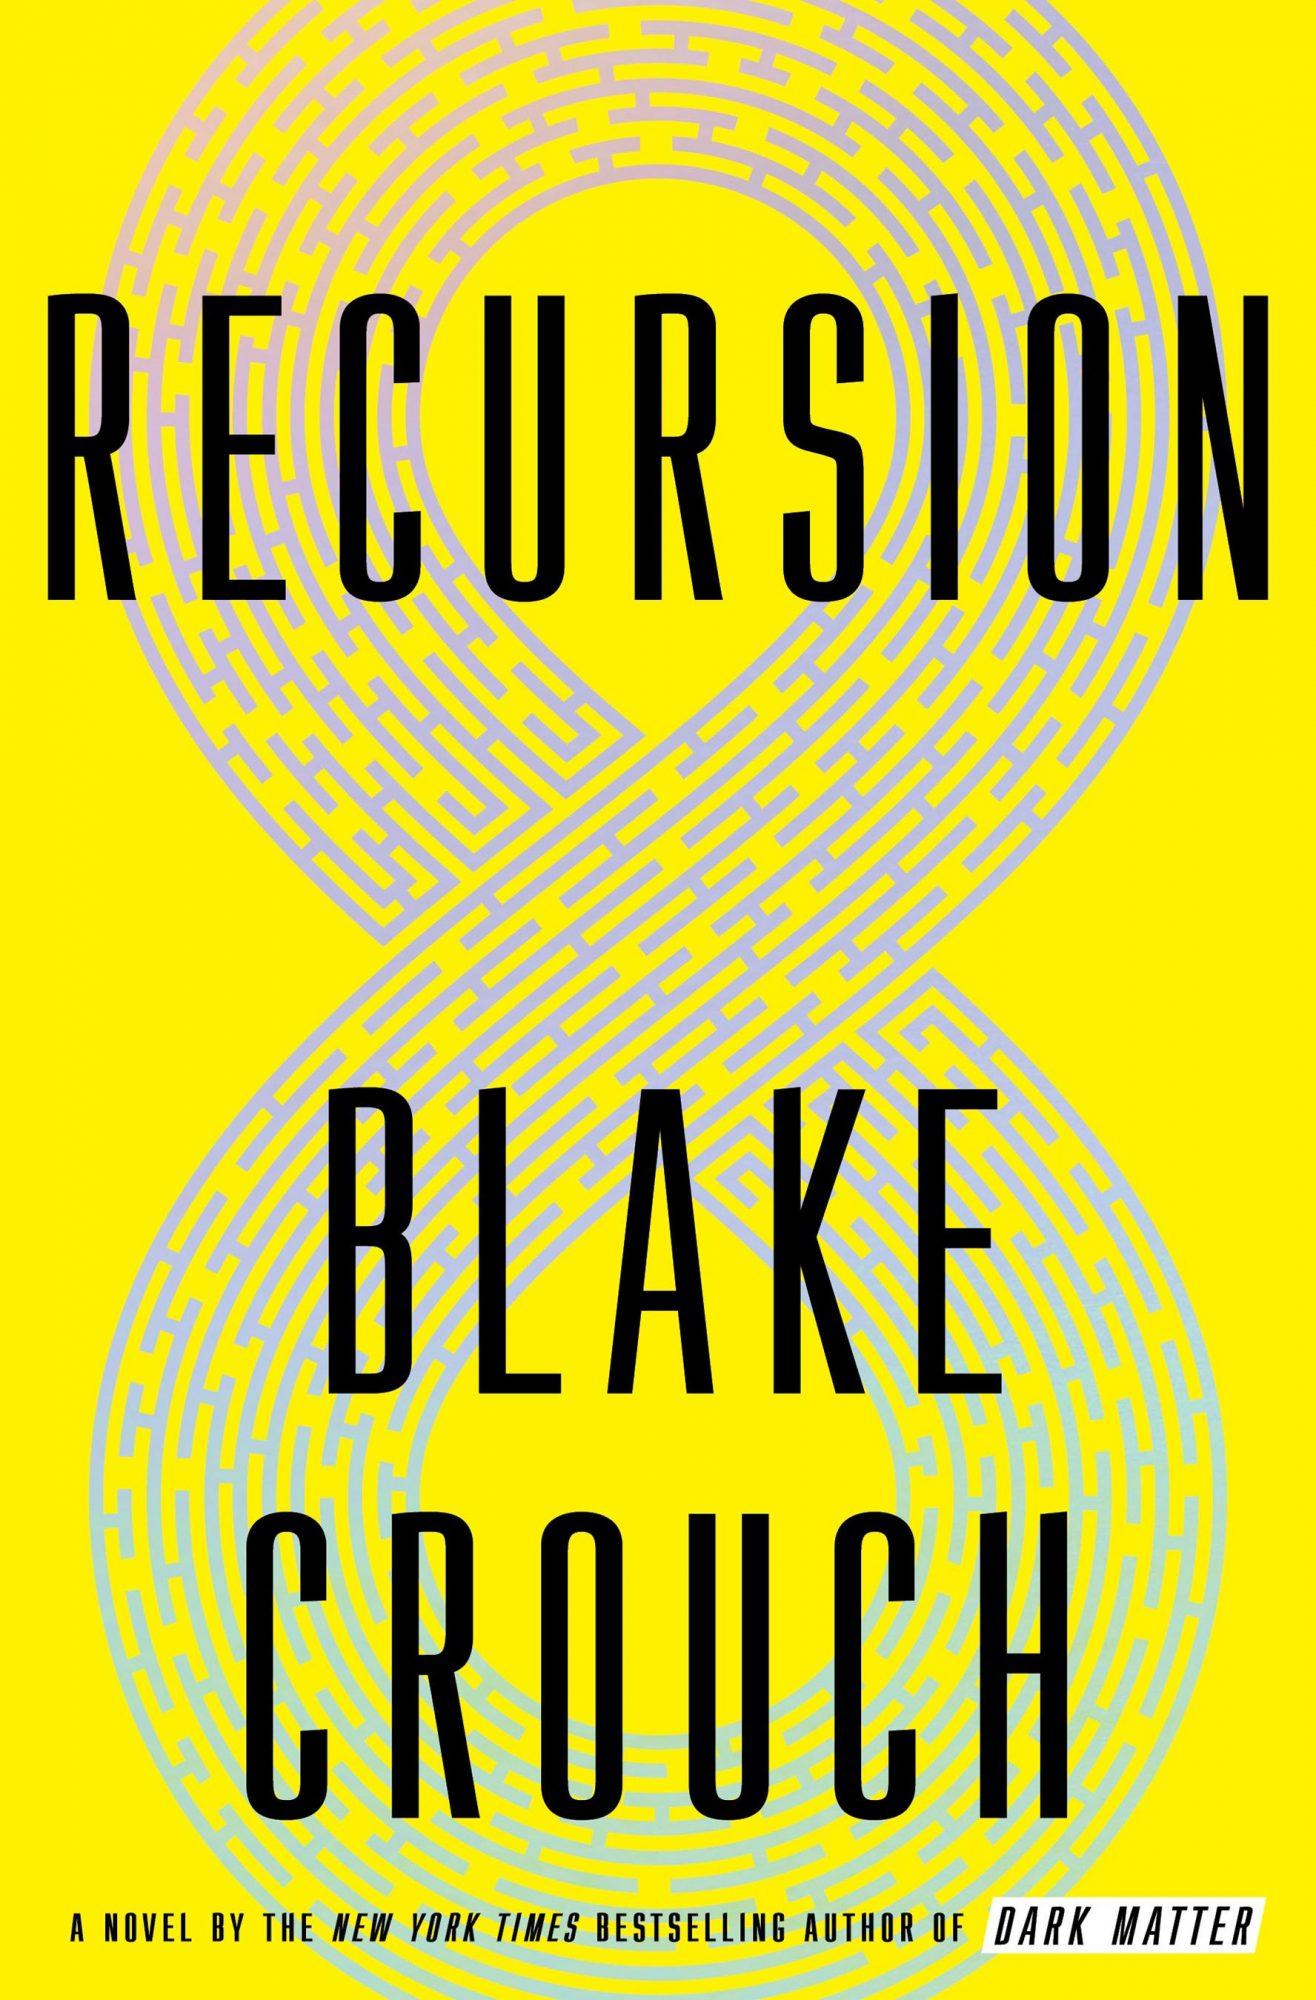 Recursion (2019)Author: Blake Crouch